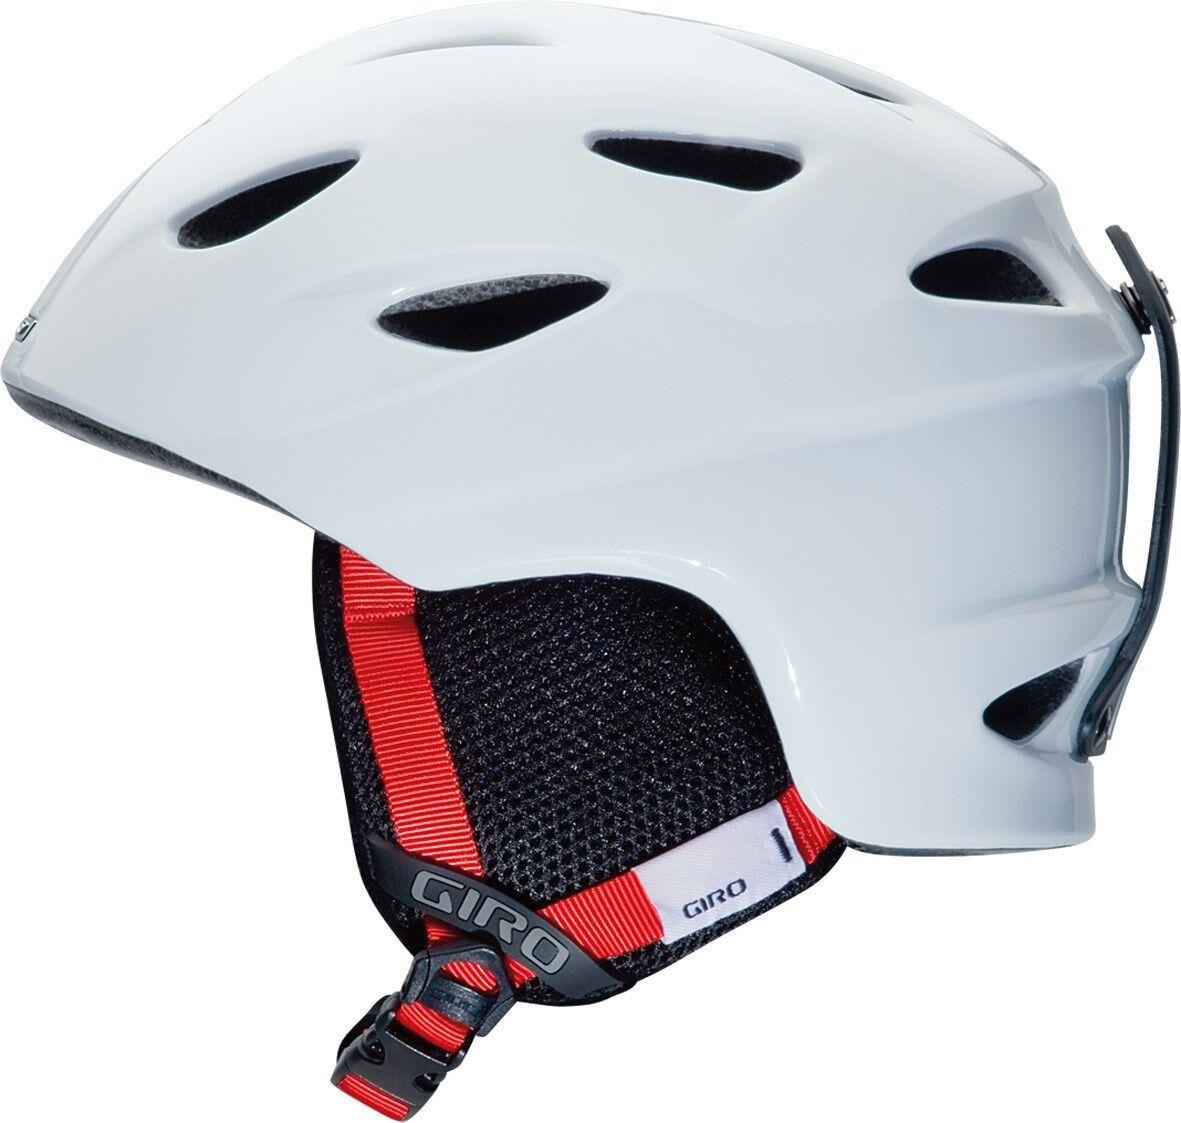 Giro G9 Jr. Youth Ski & Snowboard Helmet - White SIZE SMALL